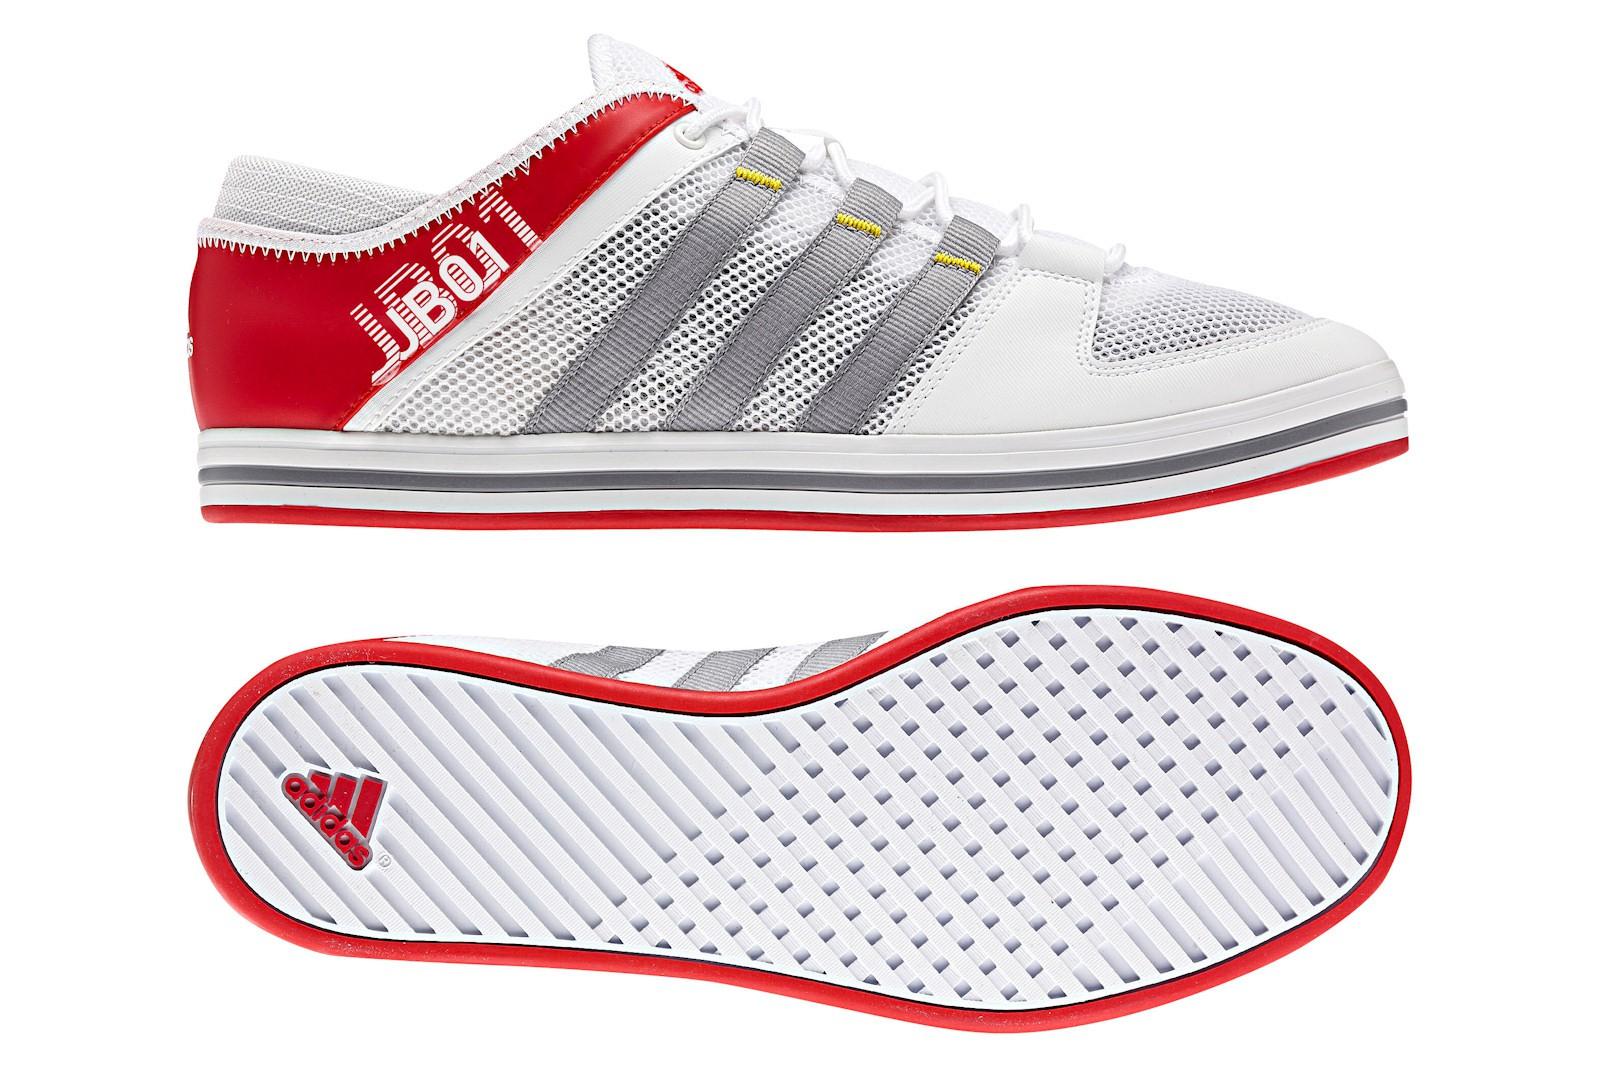 Adidas Sailing Shoes JB01 running white/alu/vivid red